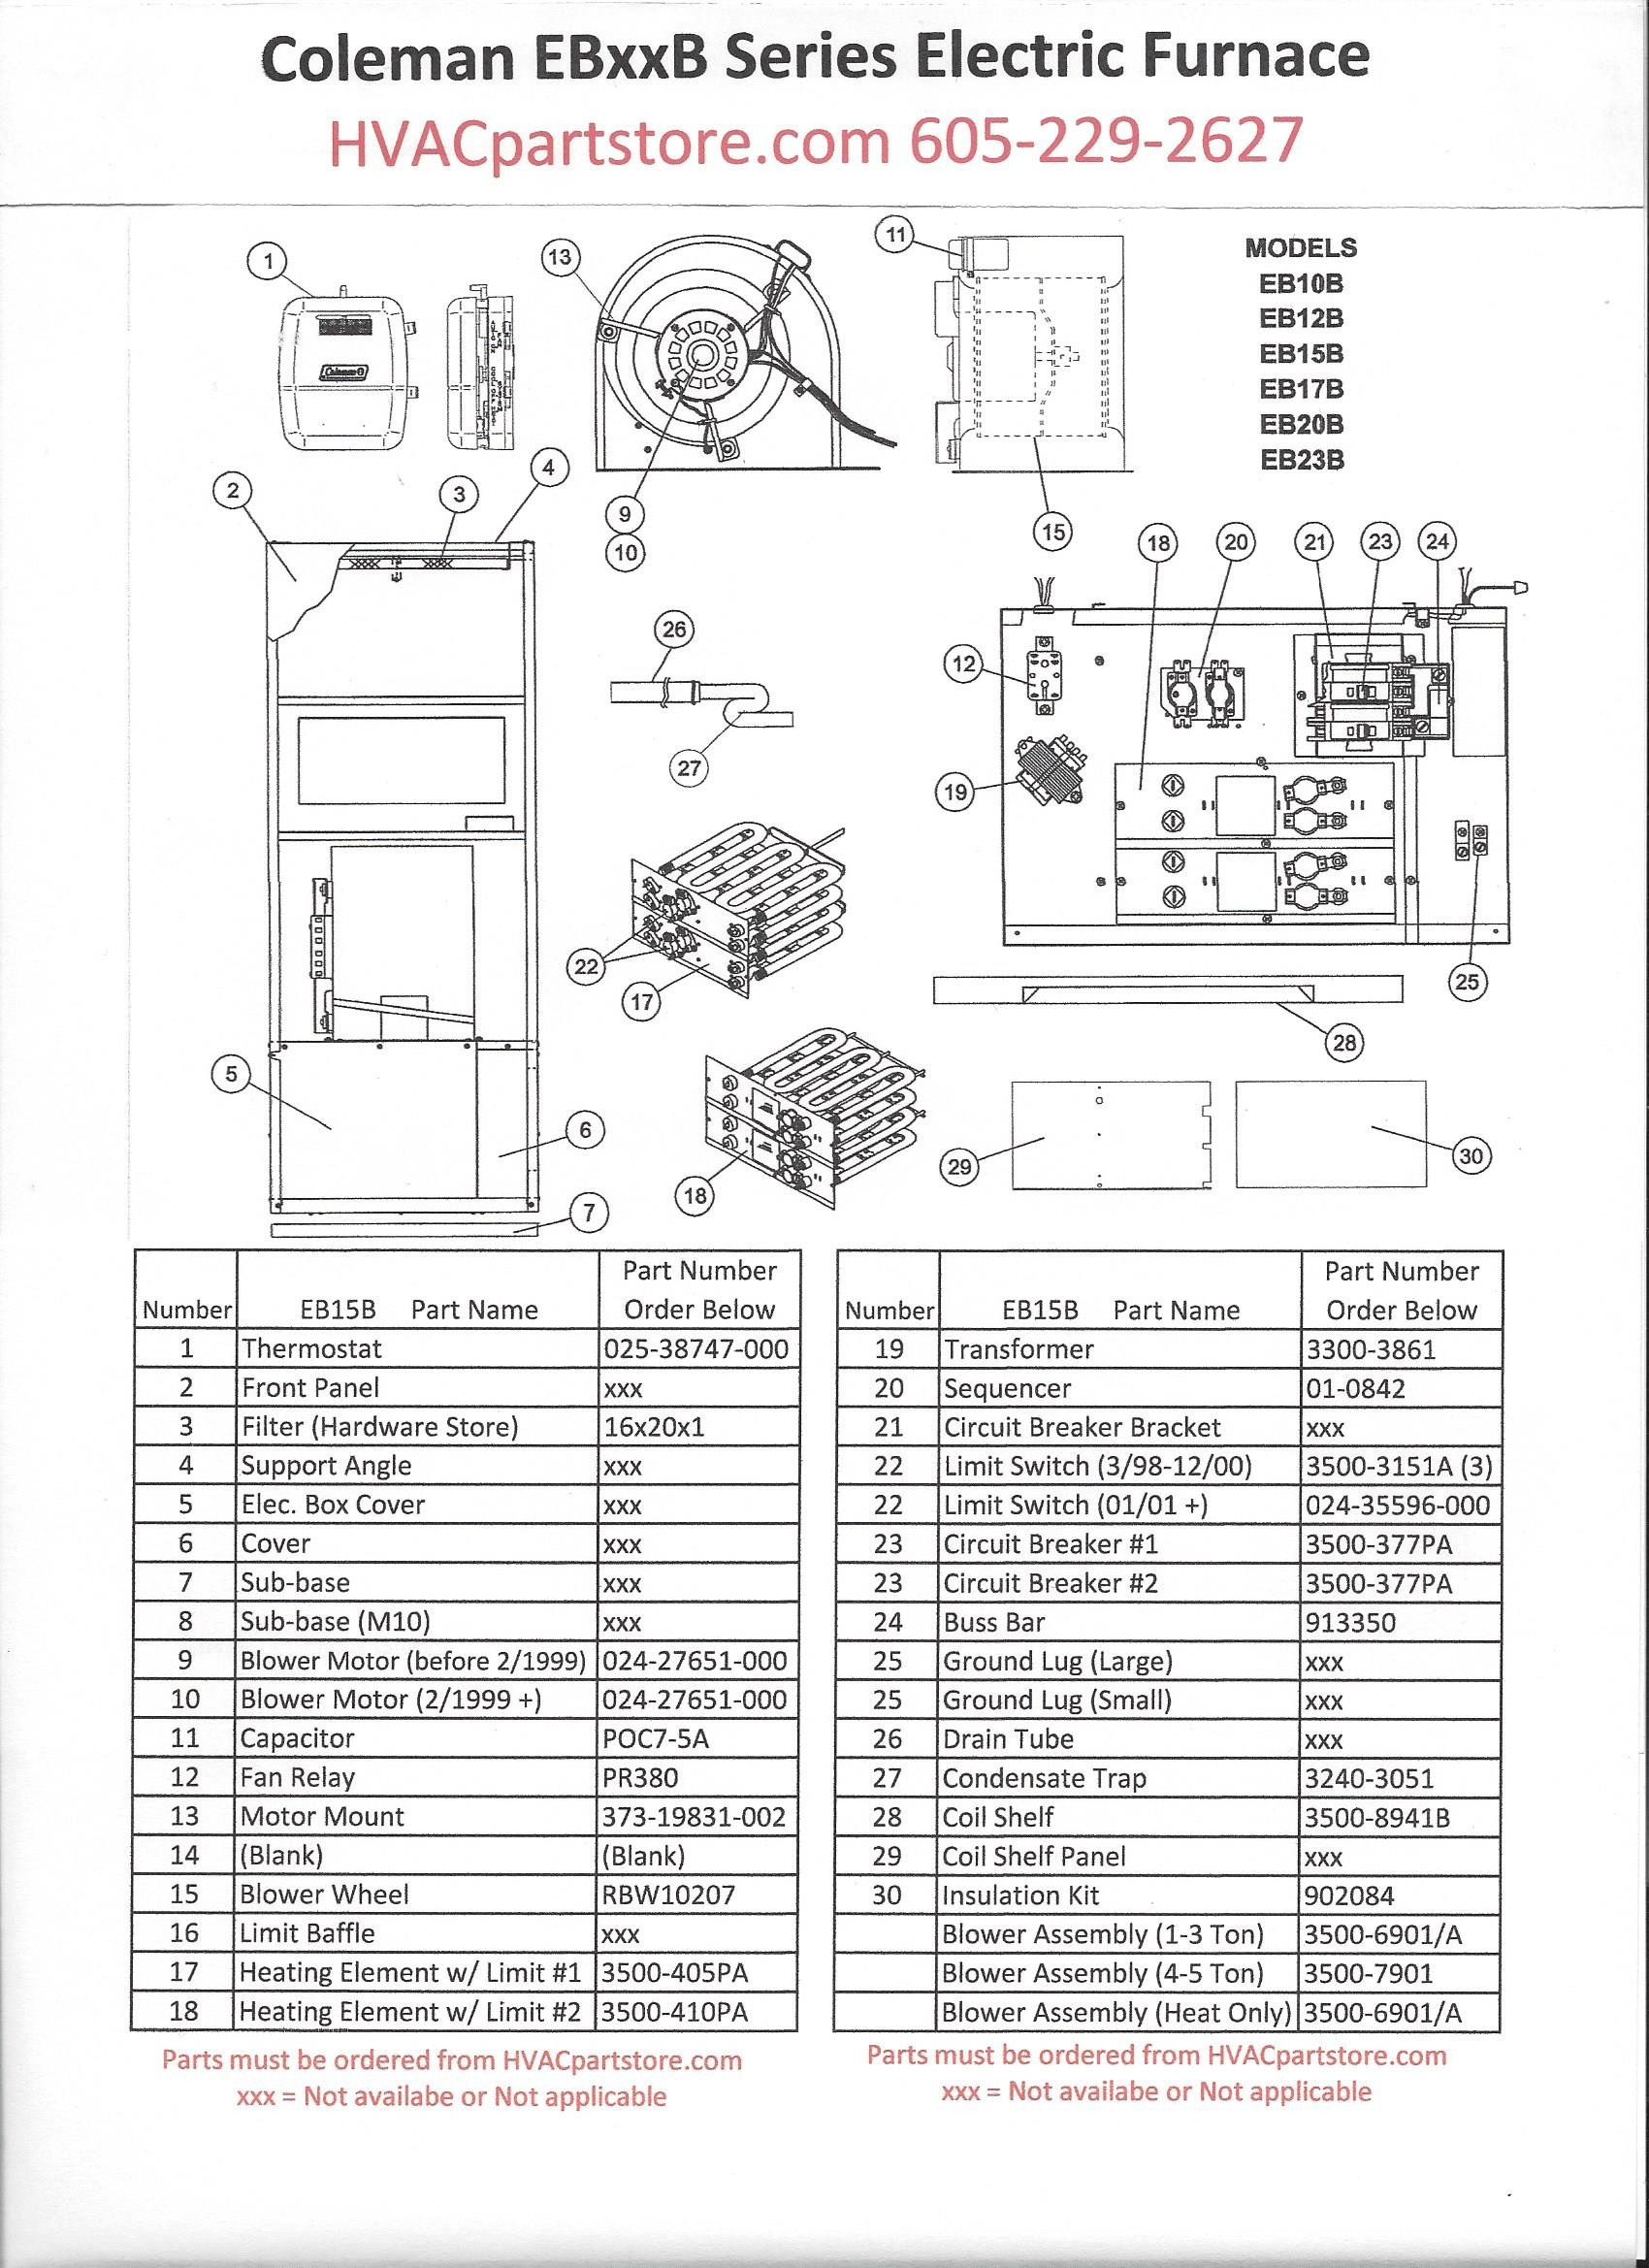 tempstar furnace wiring diagram best of beautiful intertherm rh irelandnews co Goodman Electric Furnace Wiring Diagram A C pressor Wiring Diagram